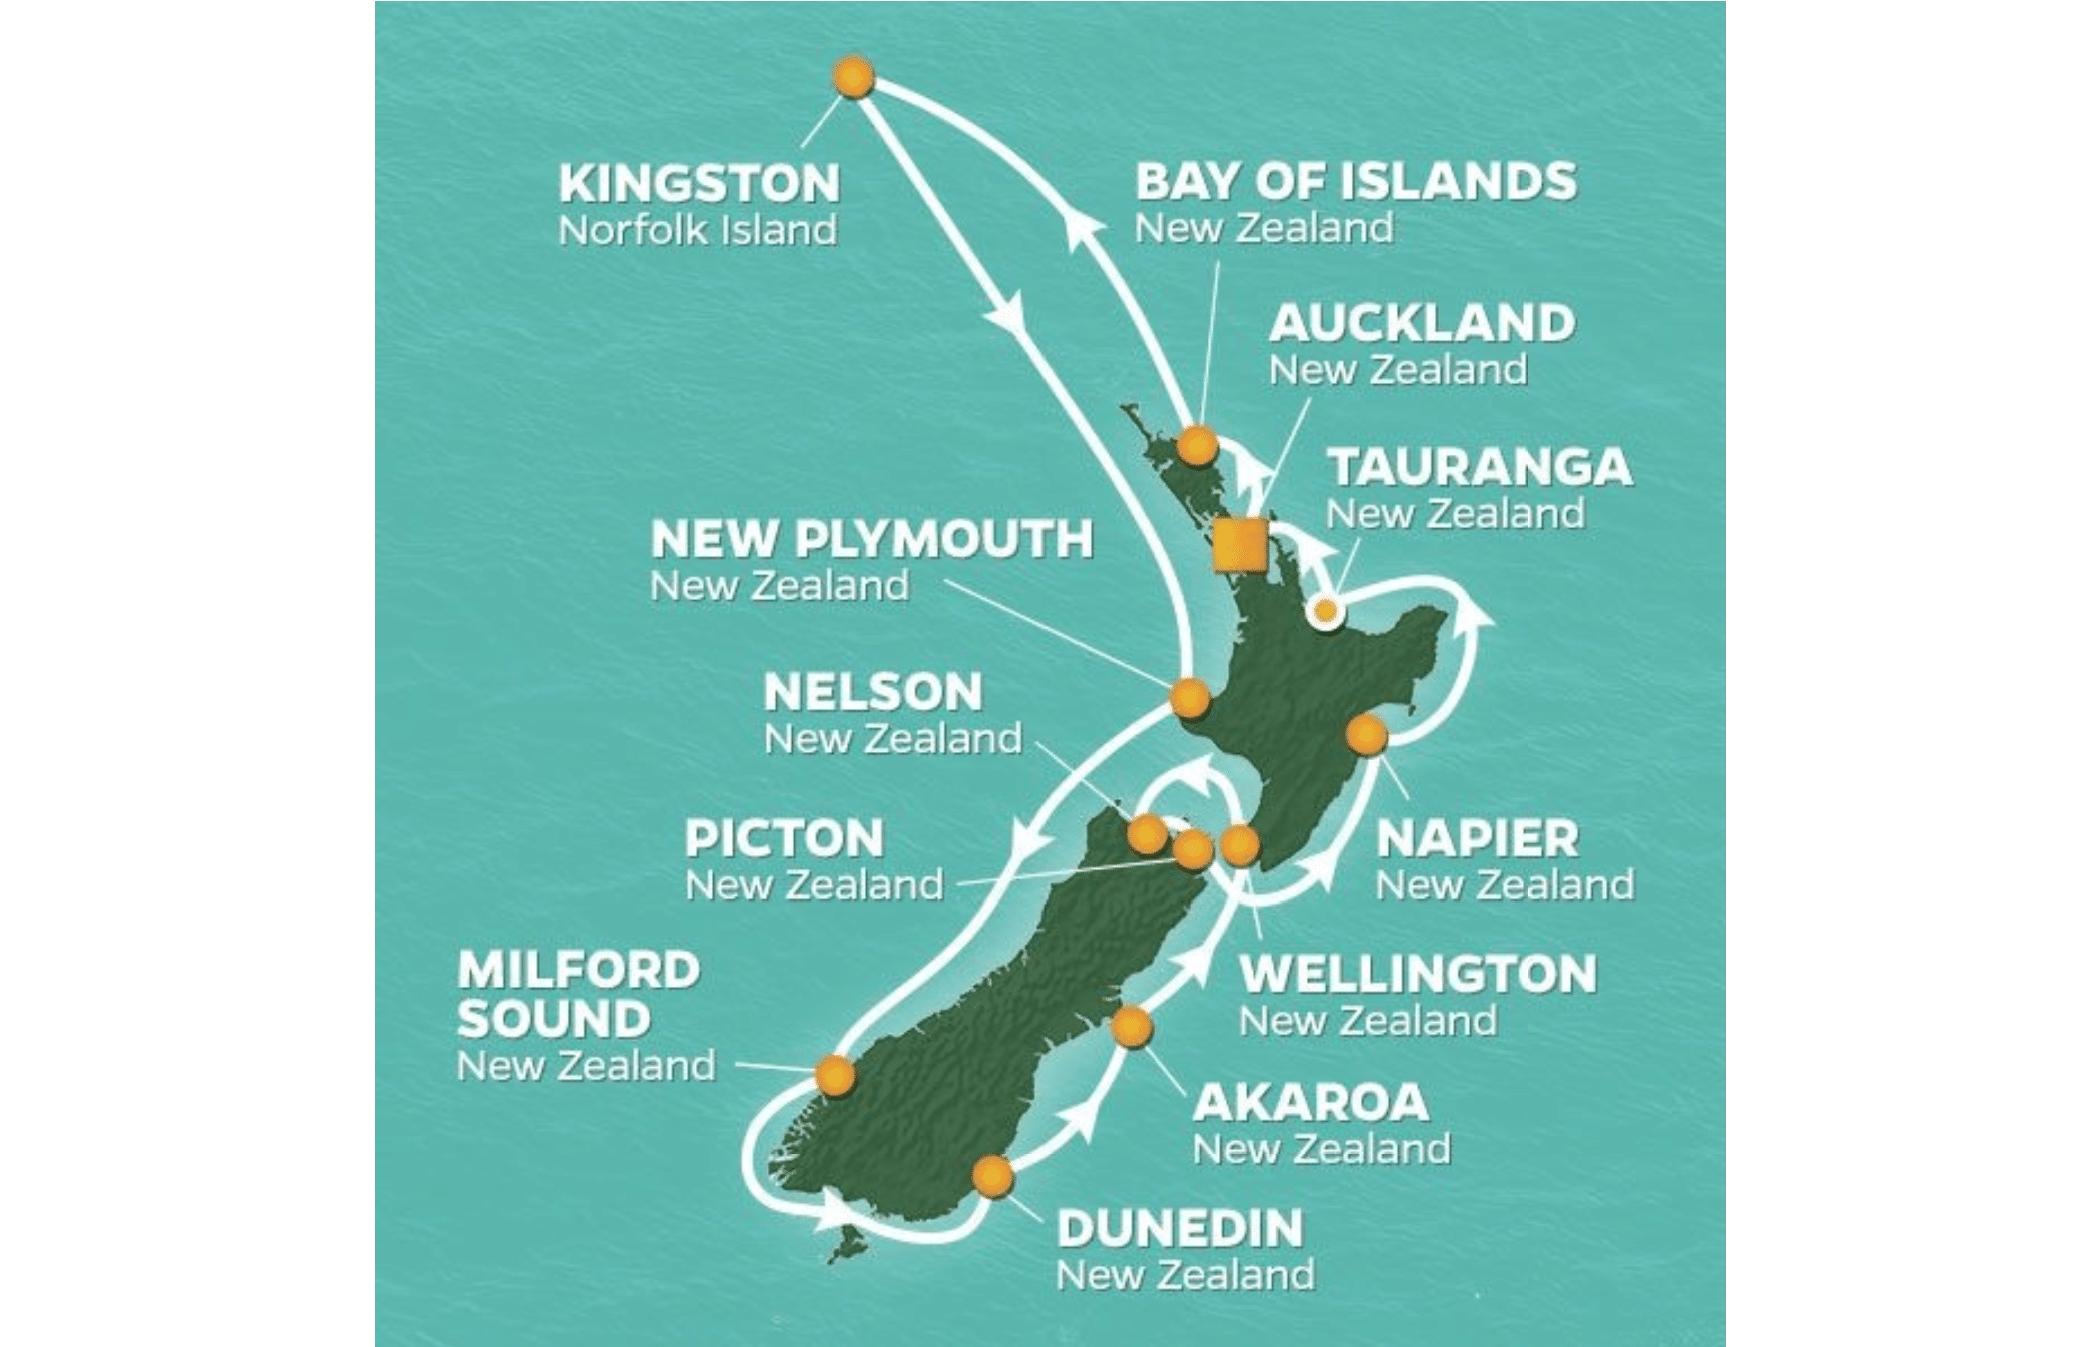 cruising to New Zealand